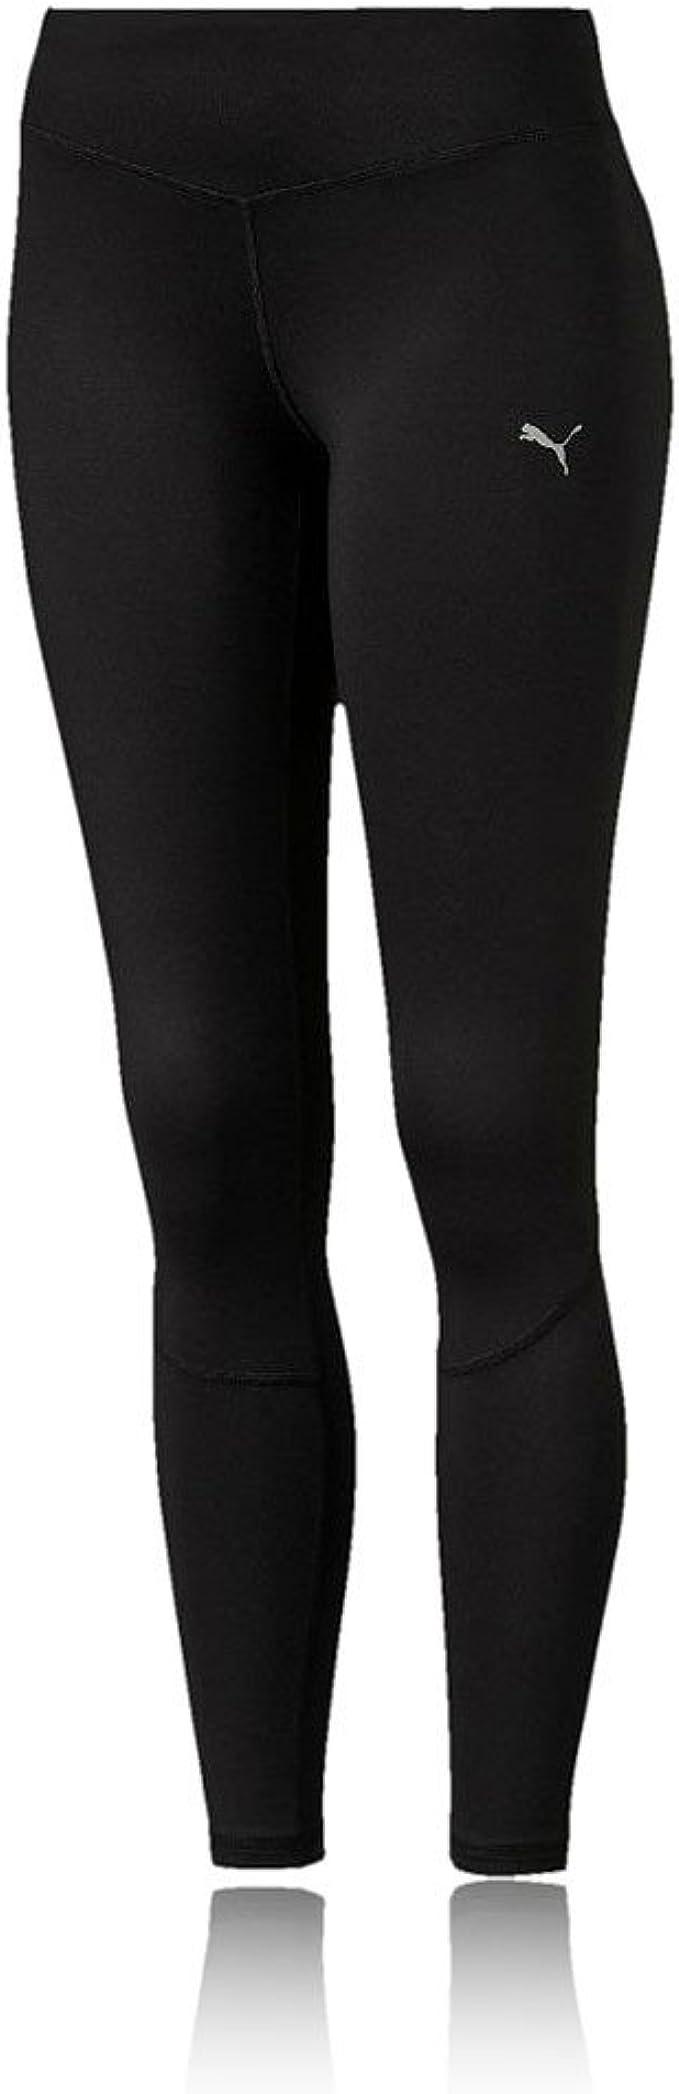 PUMA Pantalones pwrwarm Mallas W, Black